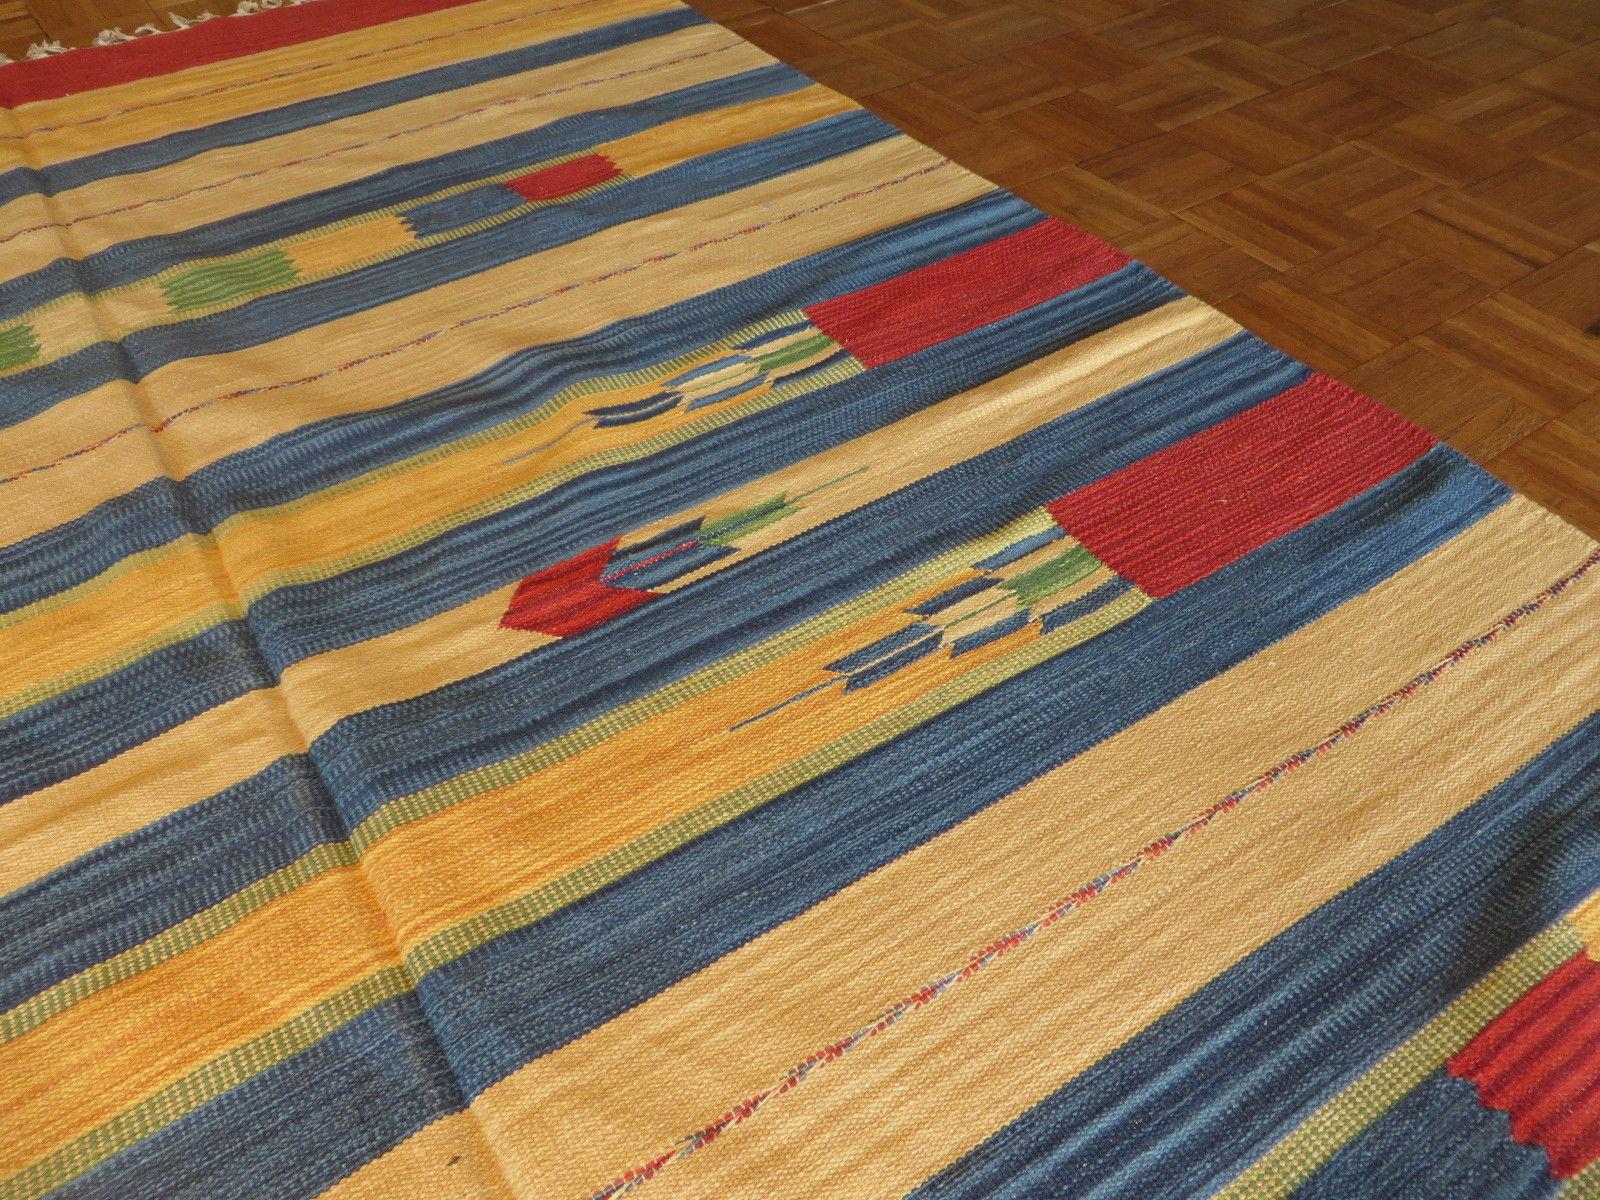 6 X 9 Dhurry Kilim Flat Weave Hand Woven Reversible Rug G3479